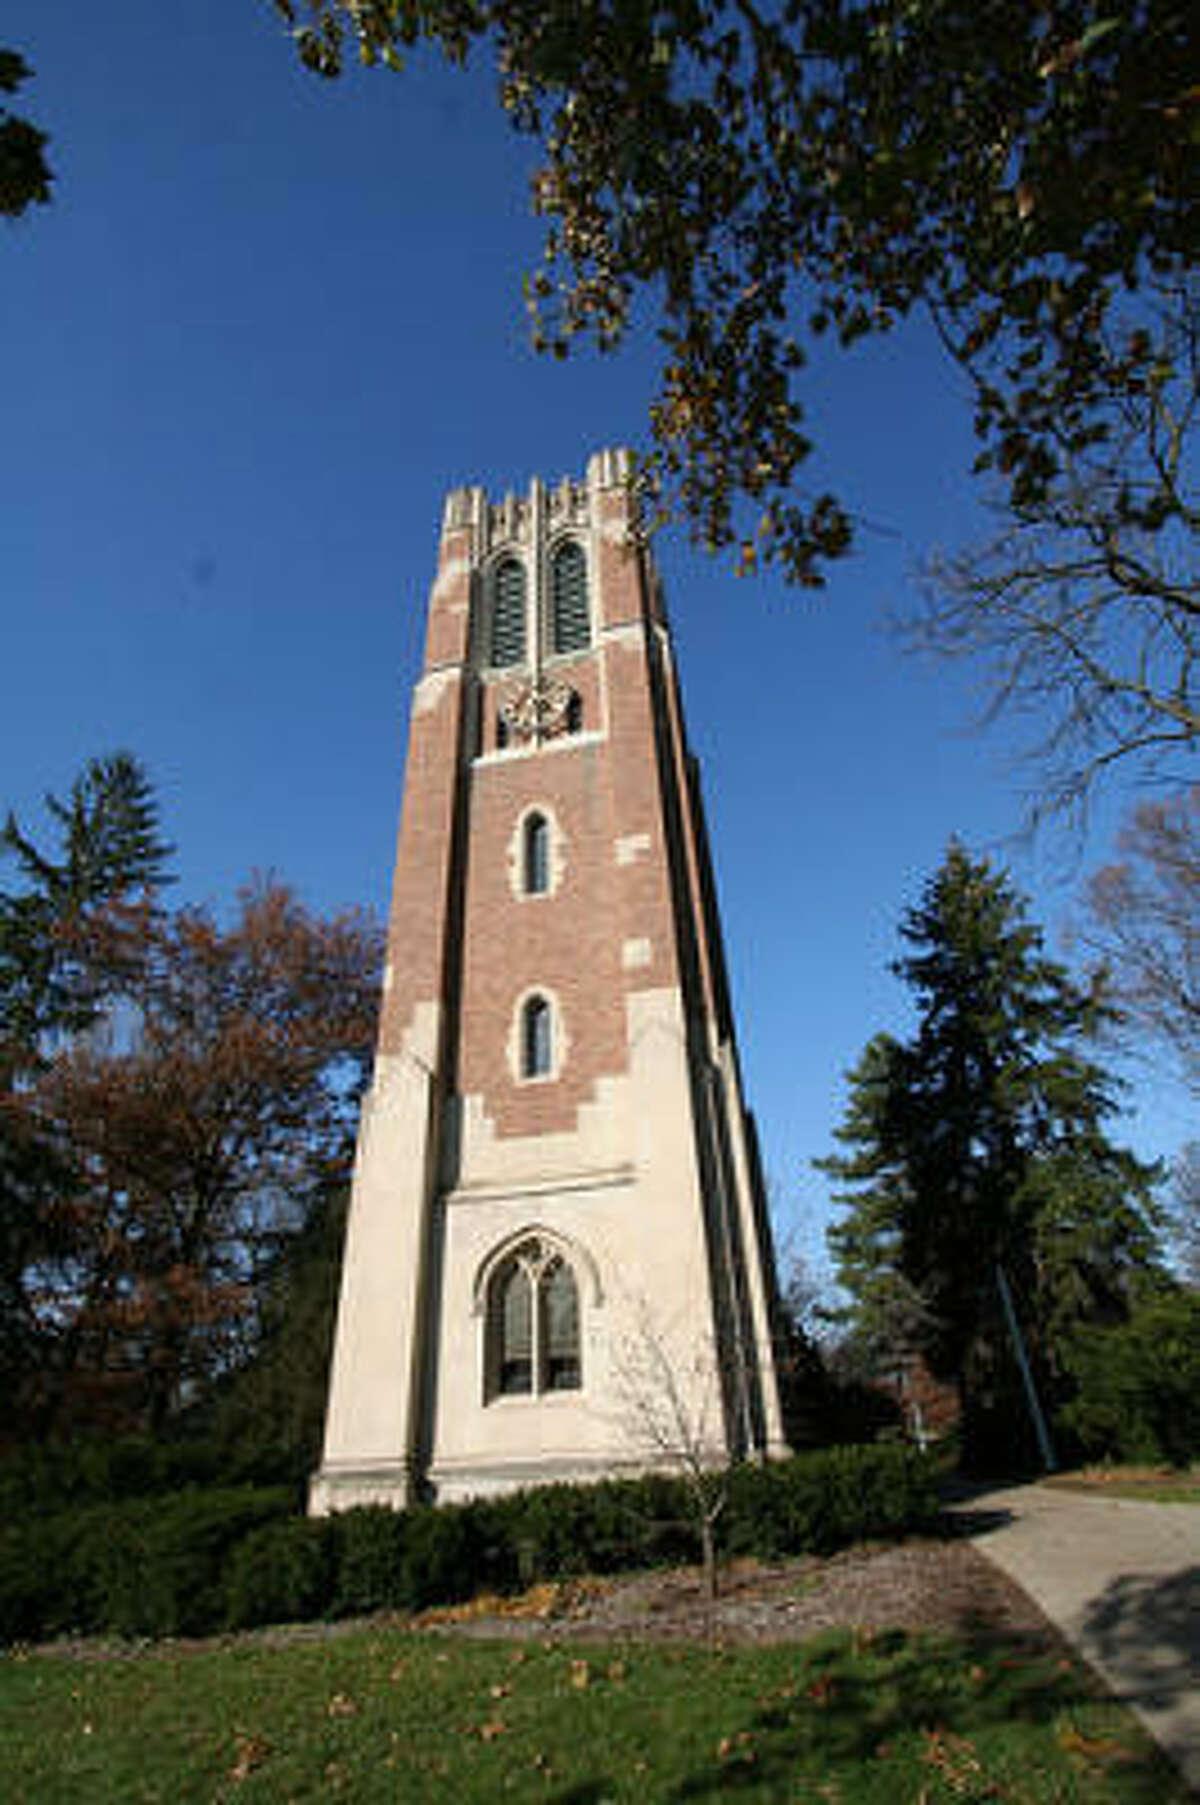 School: Michigan State University Population: 37,454 Source: US News